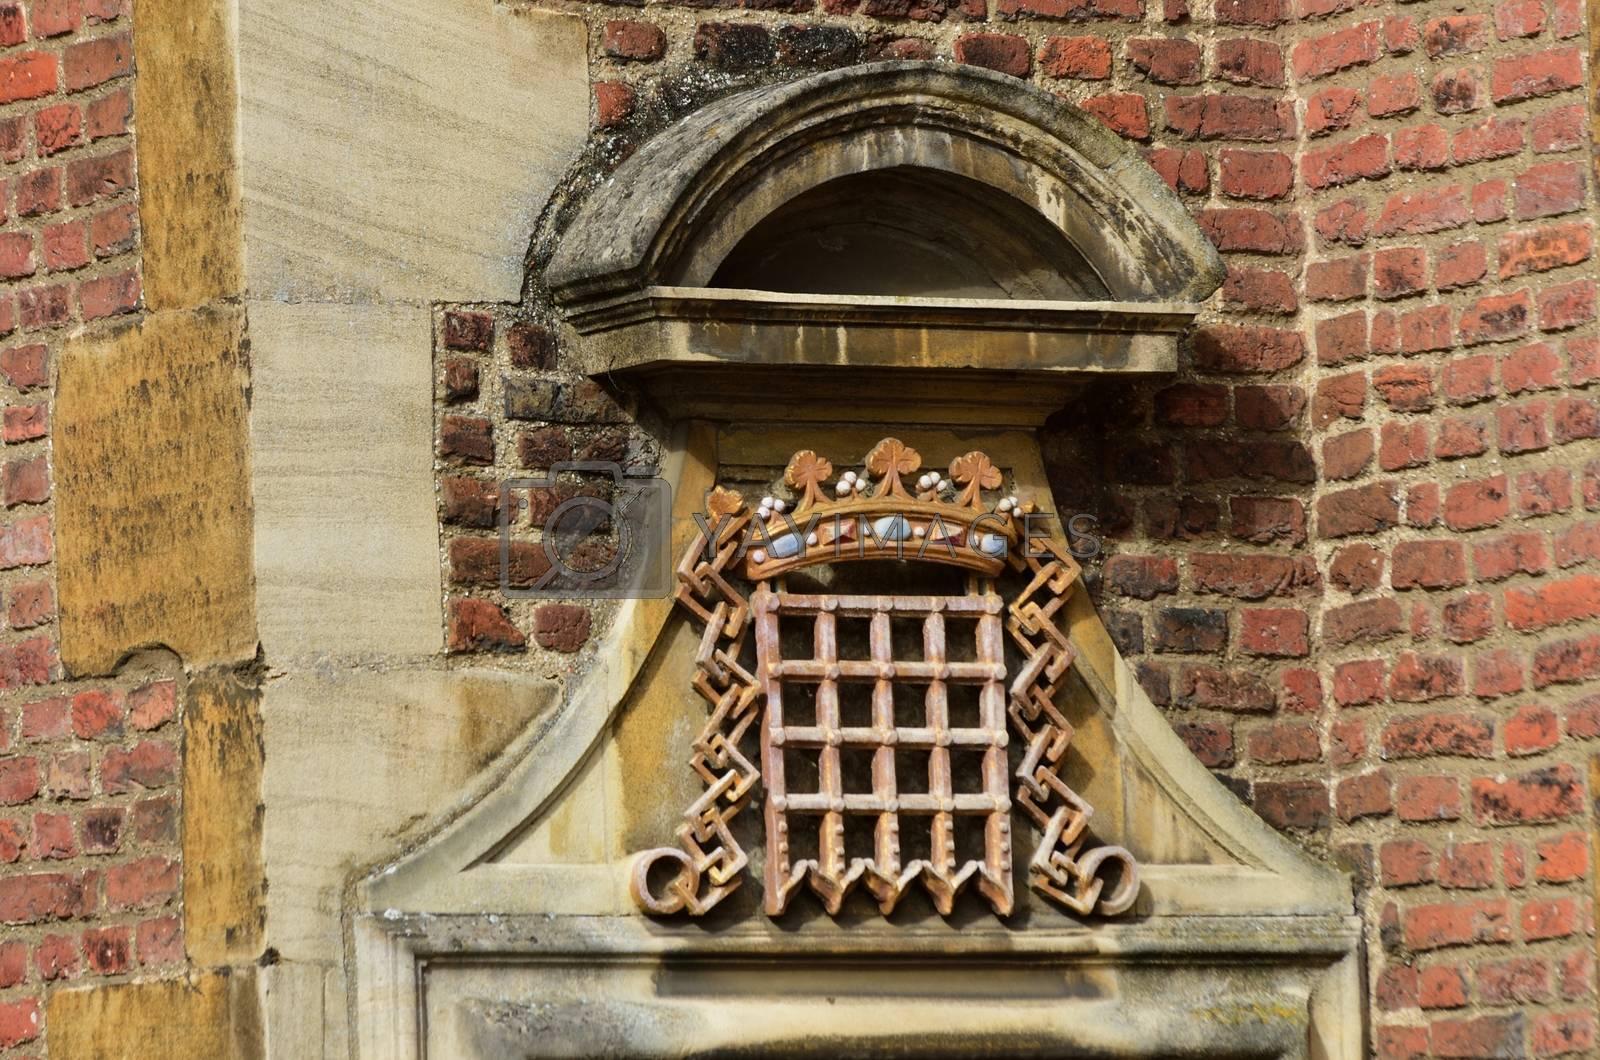 Portcullis symbol on Brick Wall